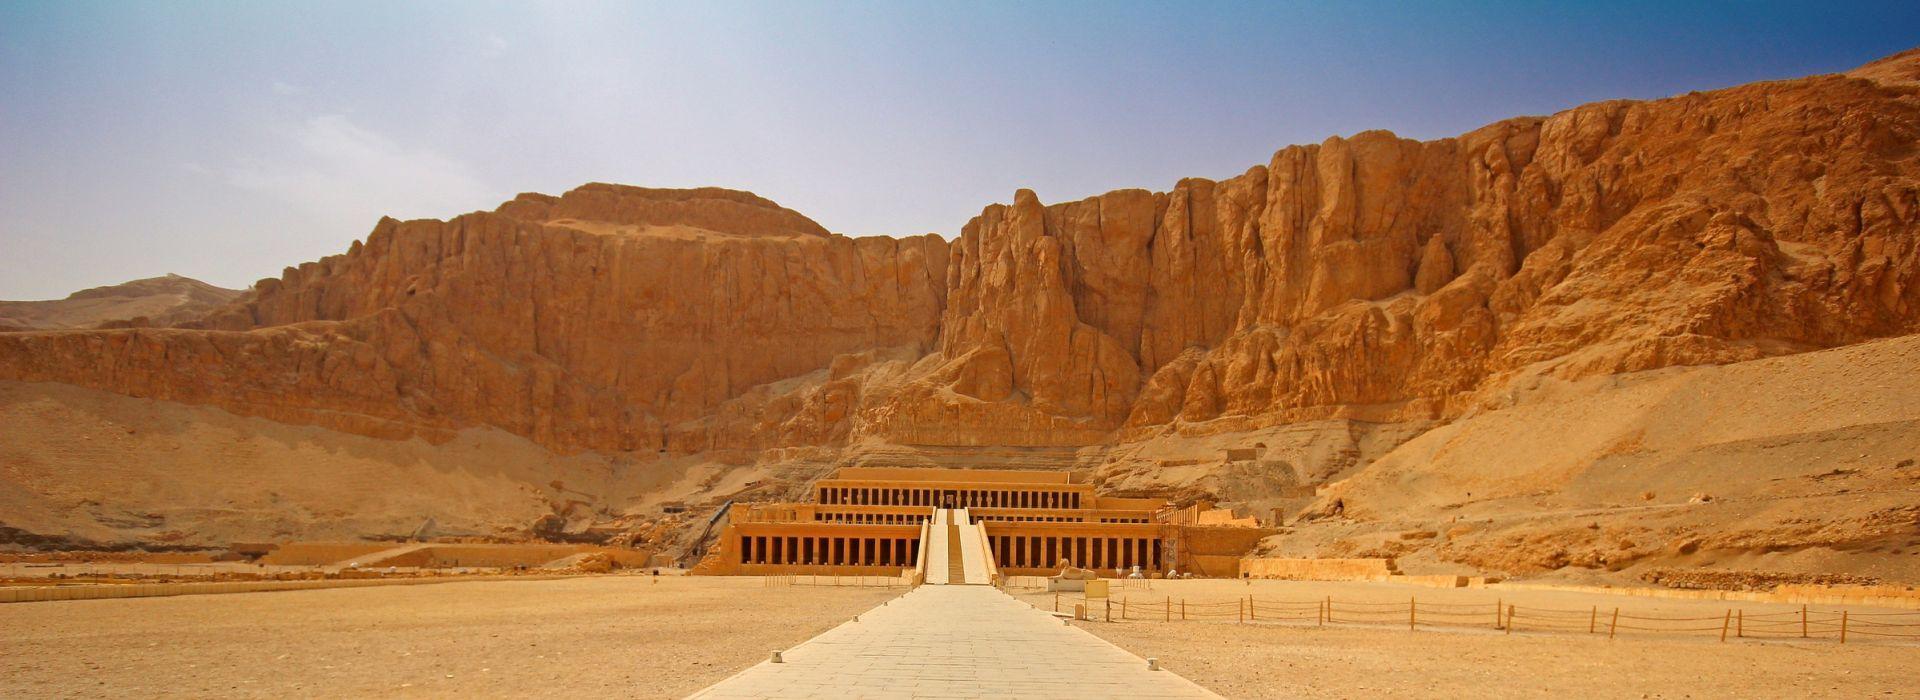 Egypt Tours and Trips to Egypt